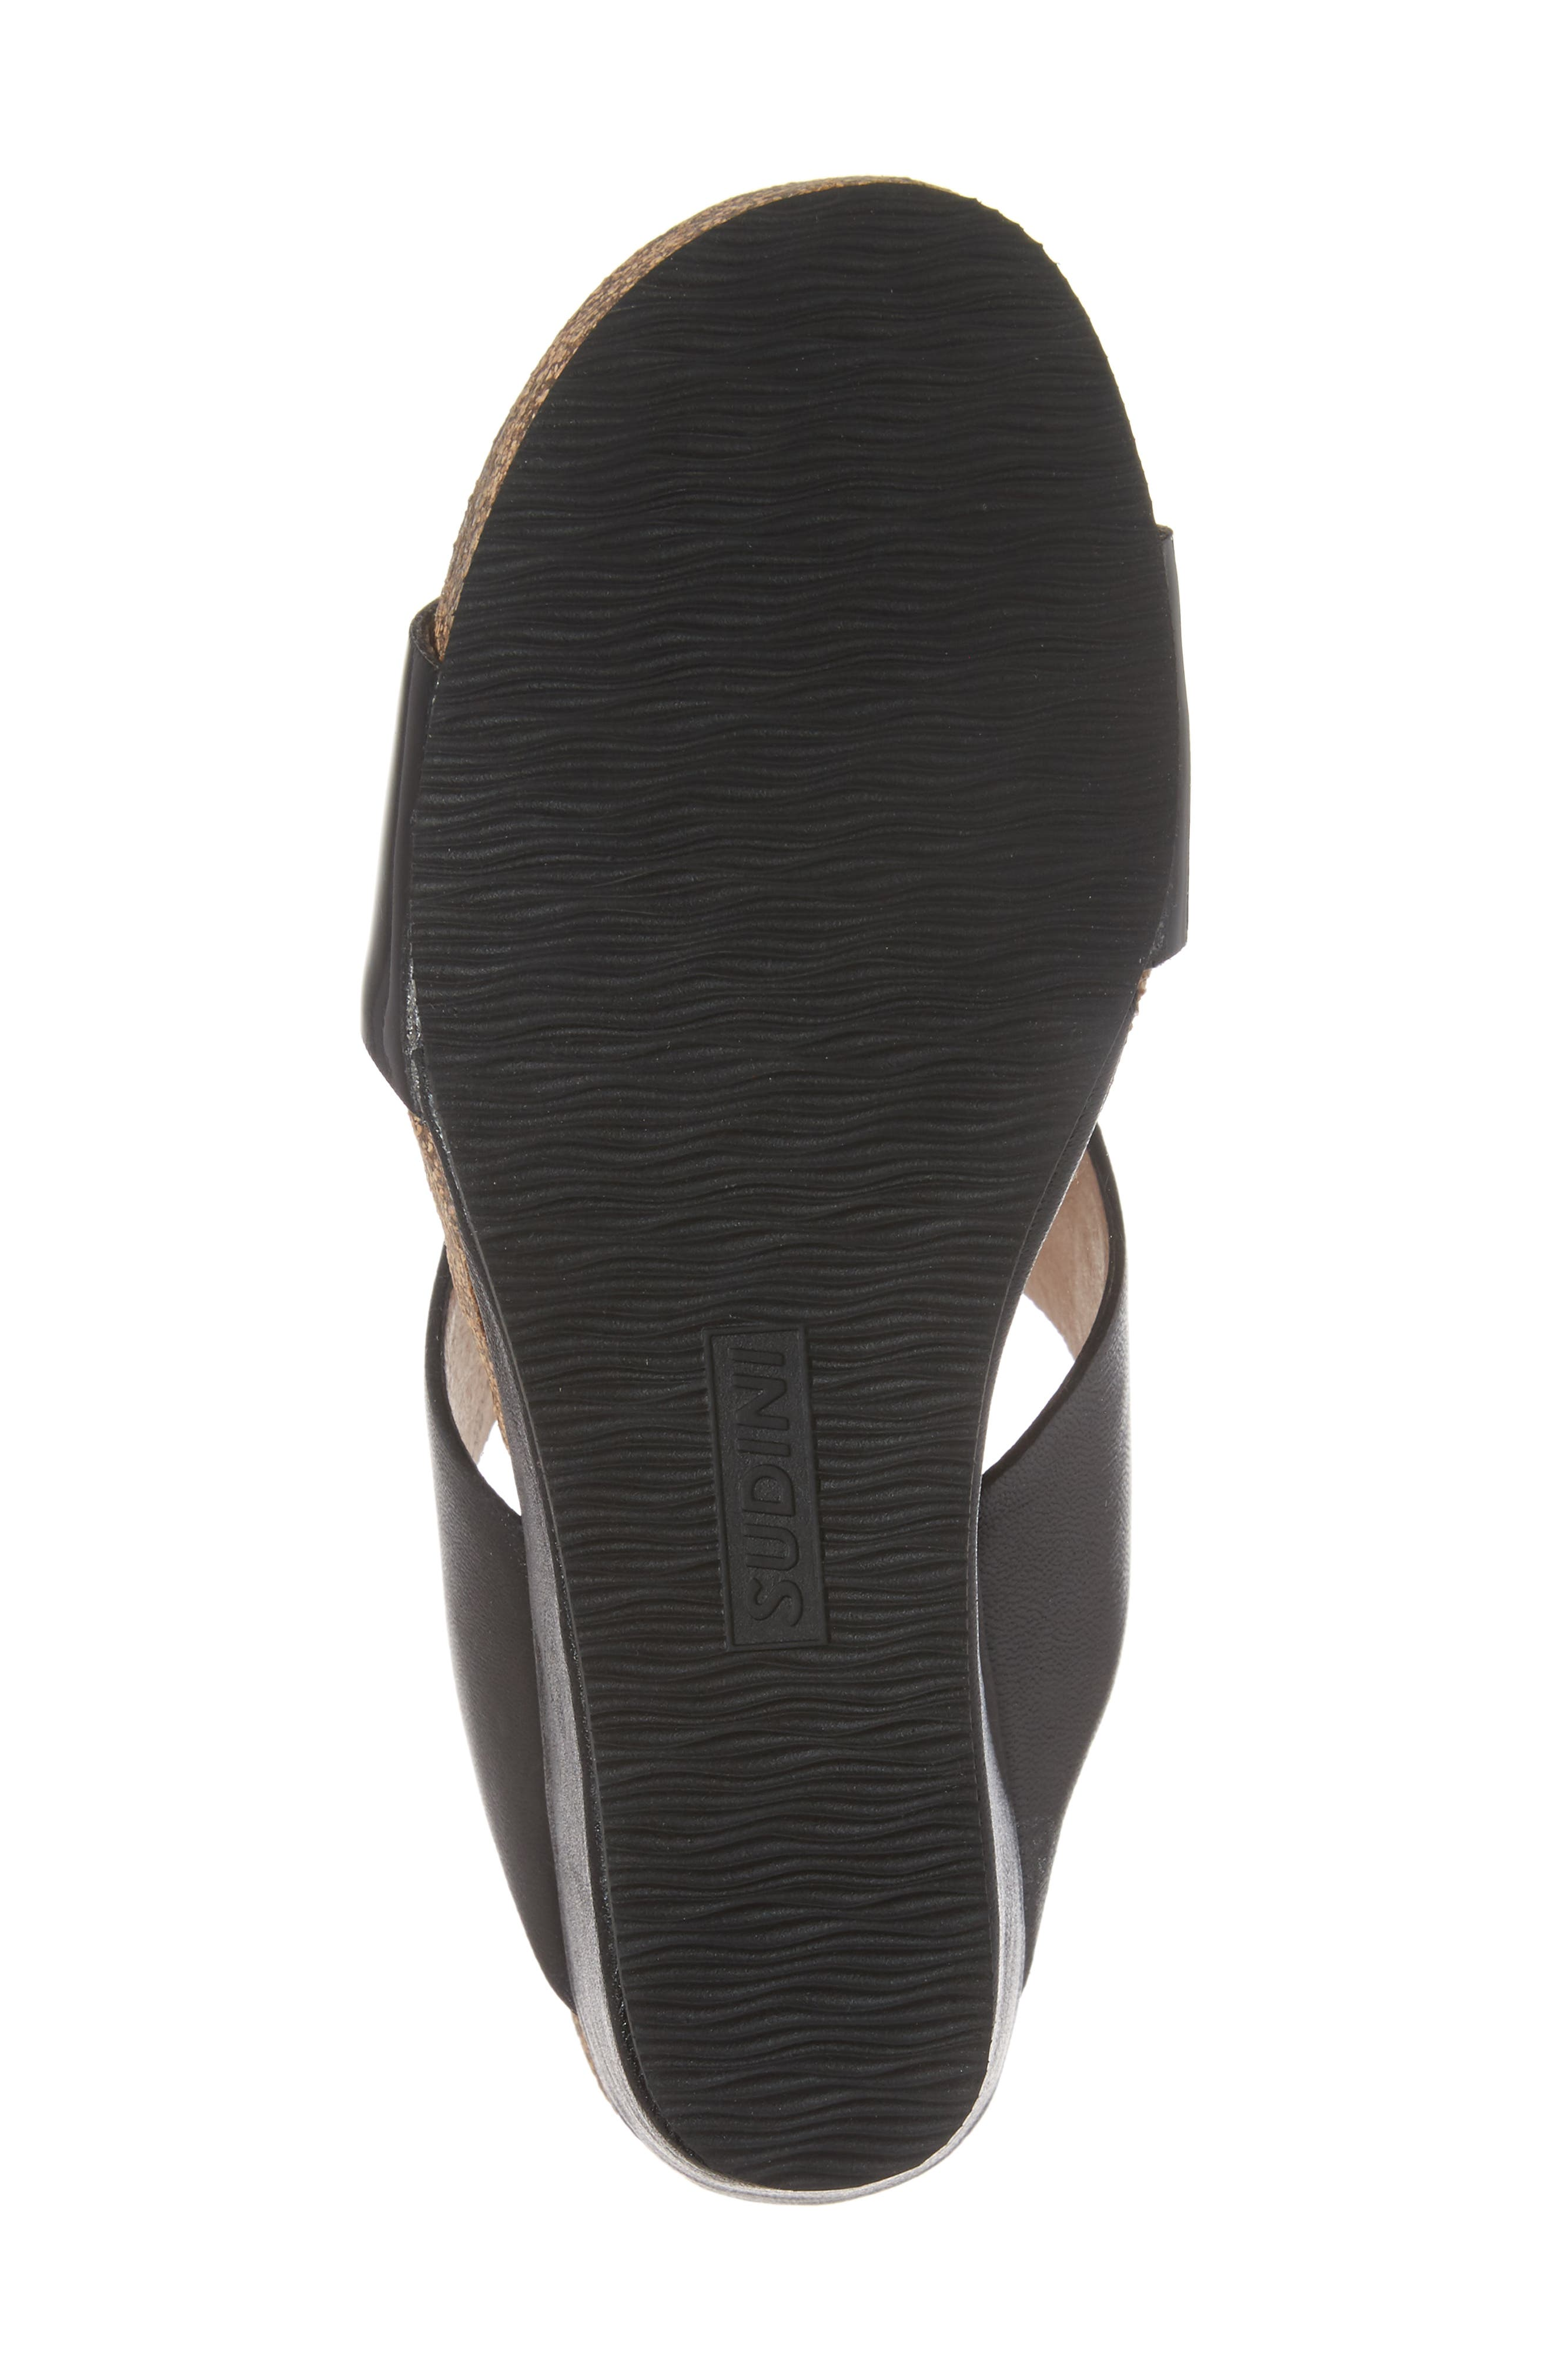 Berta Wedge Sandal,                             Alternate thumbnail 6, color,                             Black Leather